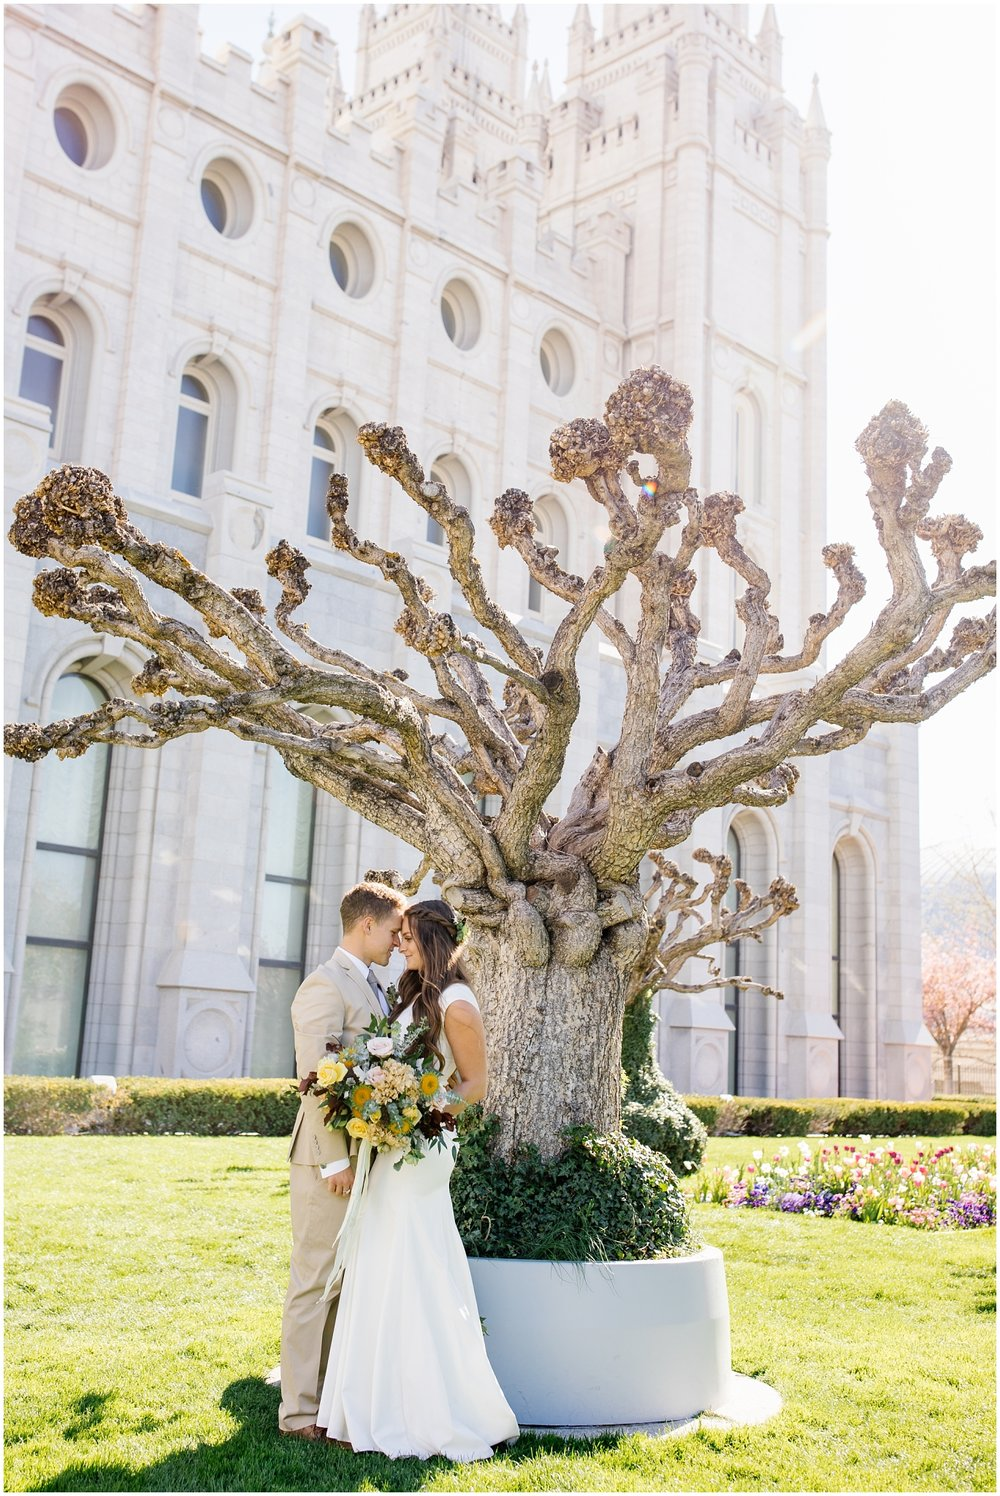 JC-Wedding-148_Lizzie-B-Imagery-Utah-Wedding-Photographer-Park-City-Salt-Lake-City-Temple-Joseph-Smith-Memorial-Building-Empire-Room.jpg